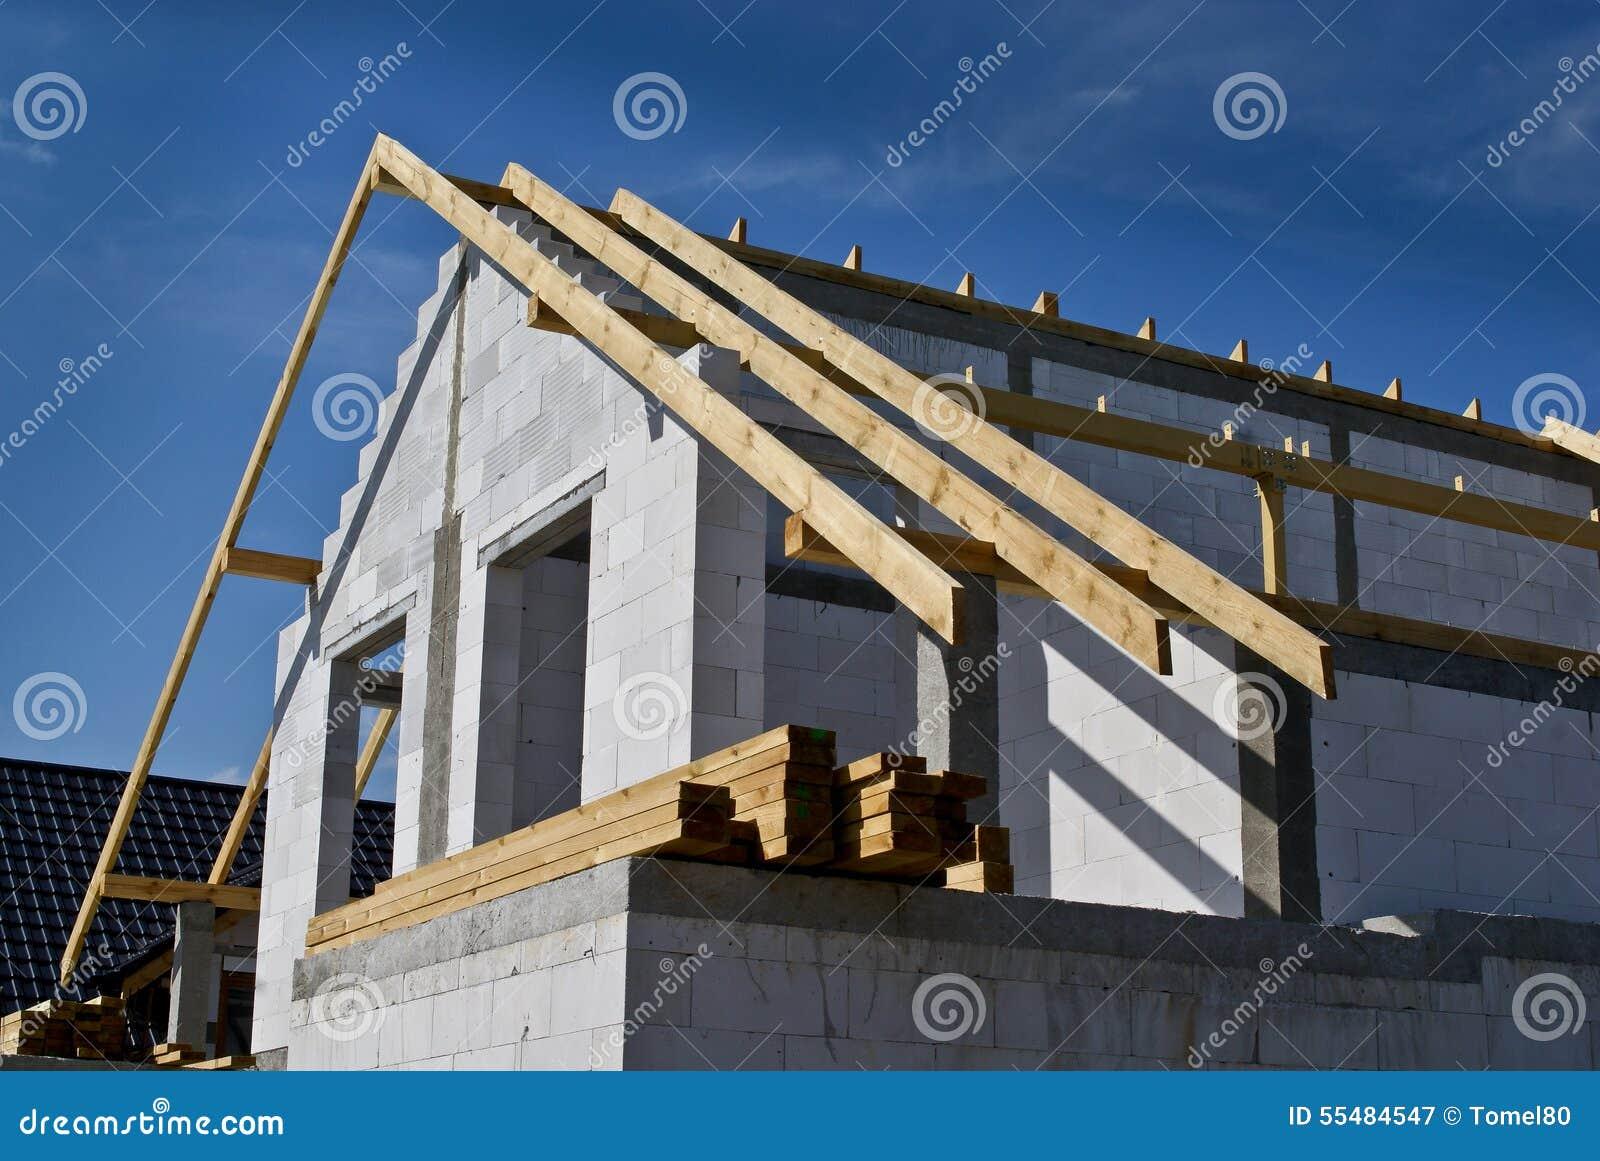 Construction Maison Mitoyenne maison mitoyenne de construction Étape de construction image stock